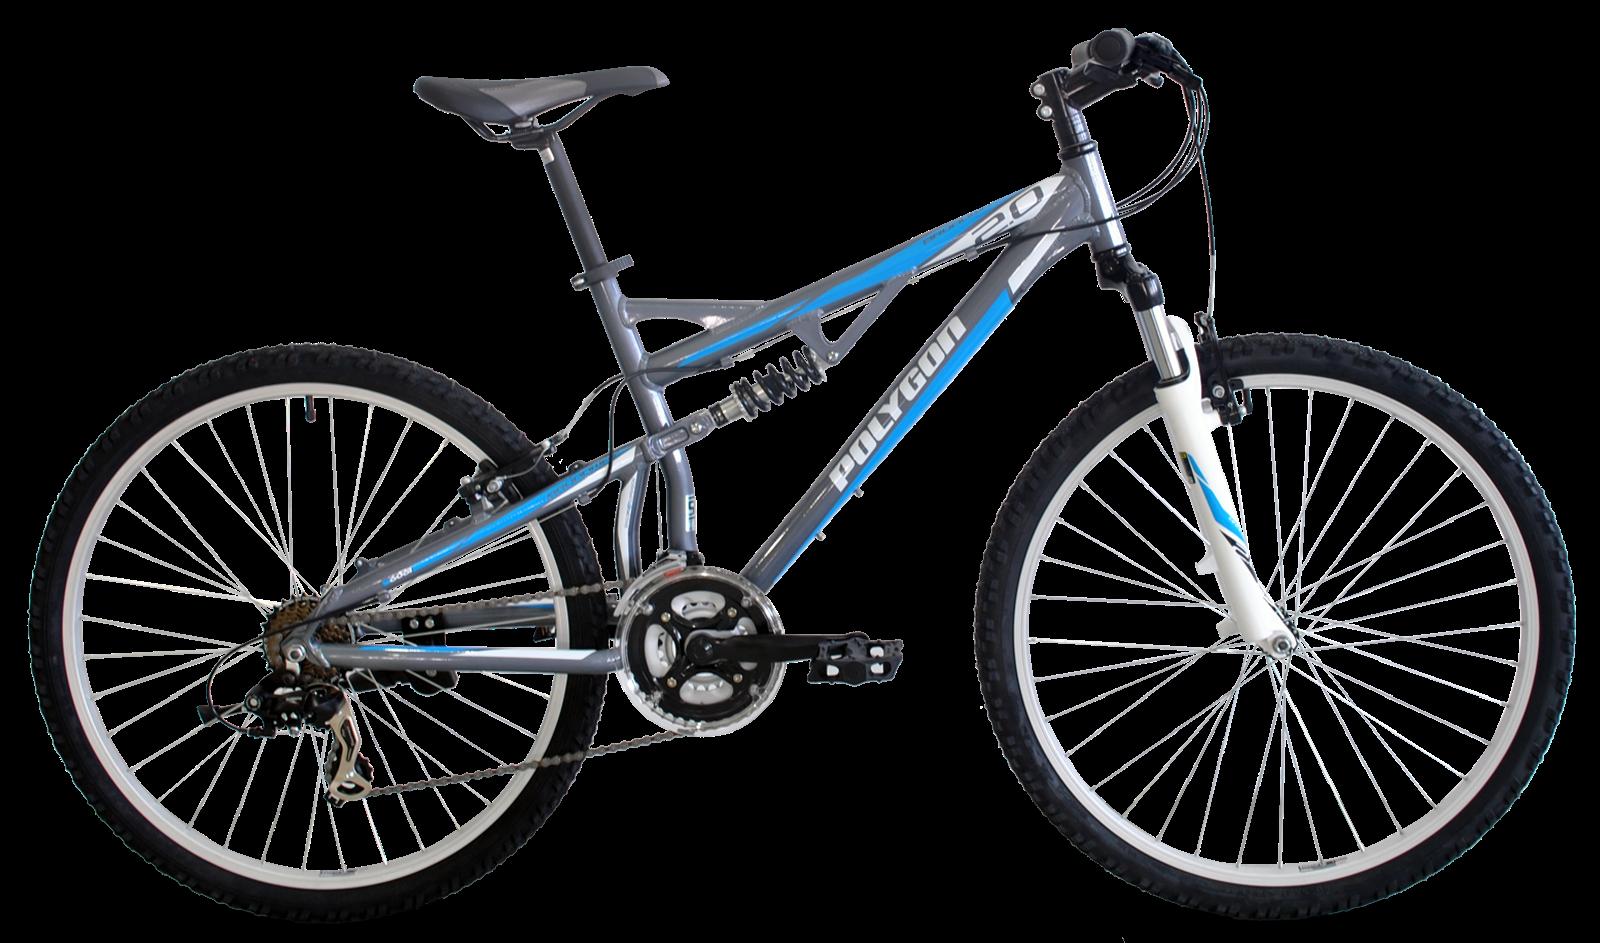 FIA BIKE: Sepeda Gunung Polygon BROADWAY 2.0 (Series 2013)